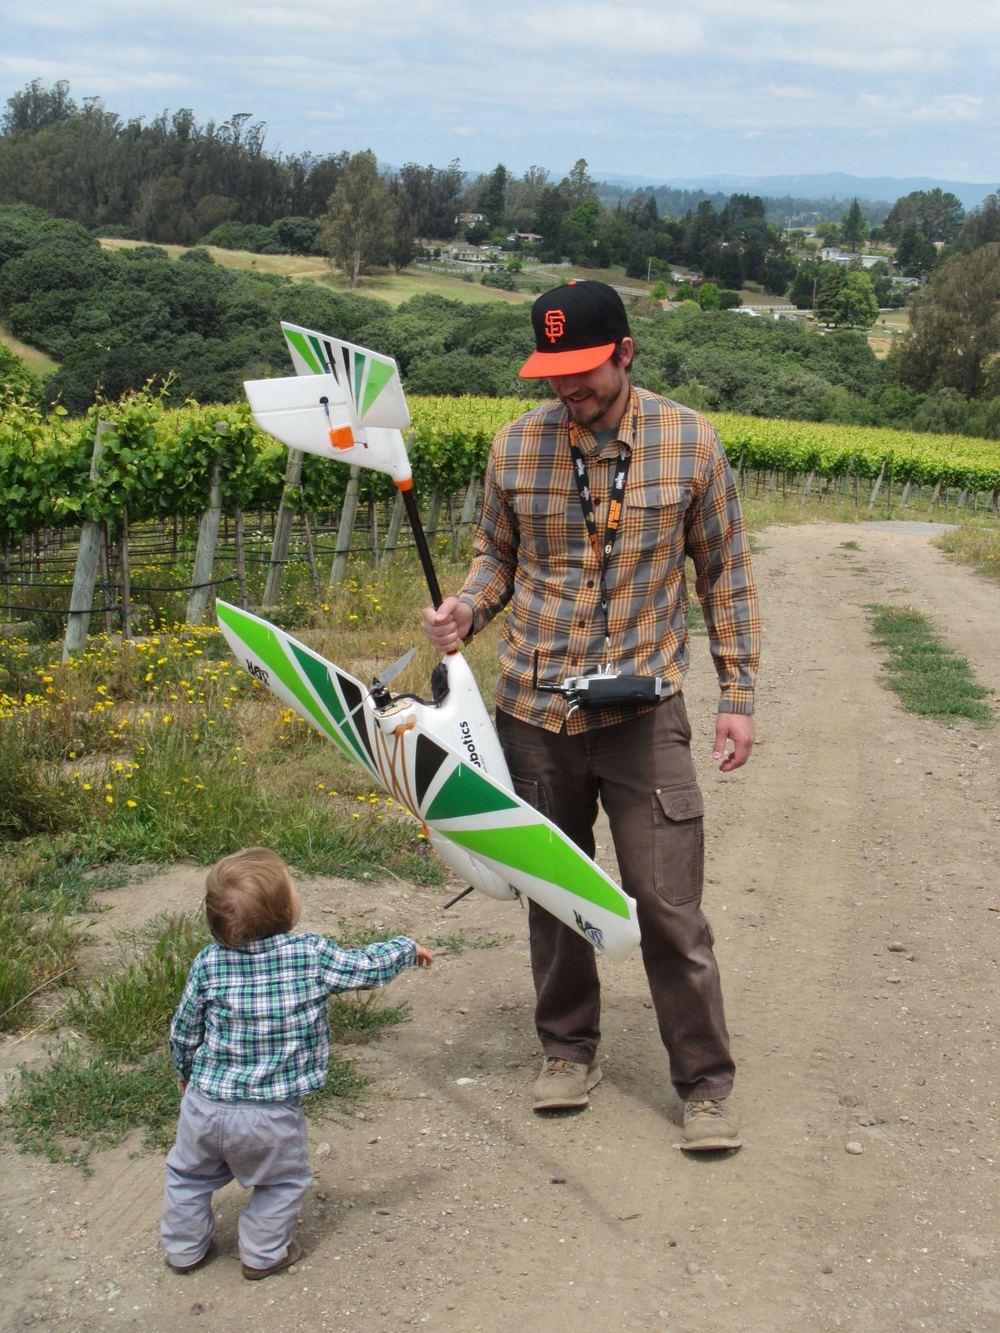 Ryan & Henry at Pinot Hill Vineyards